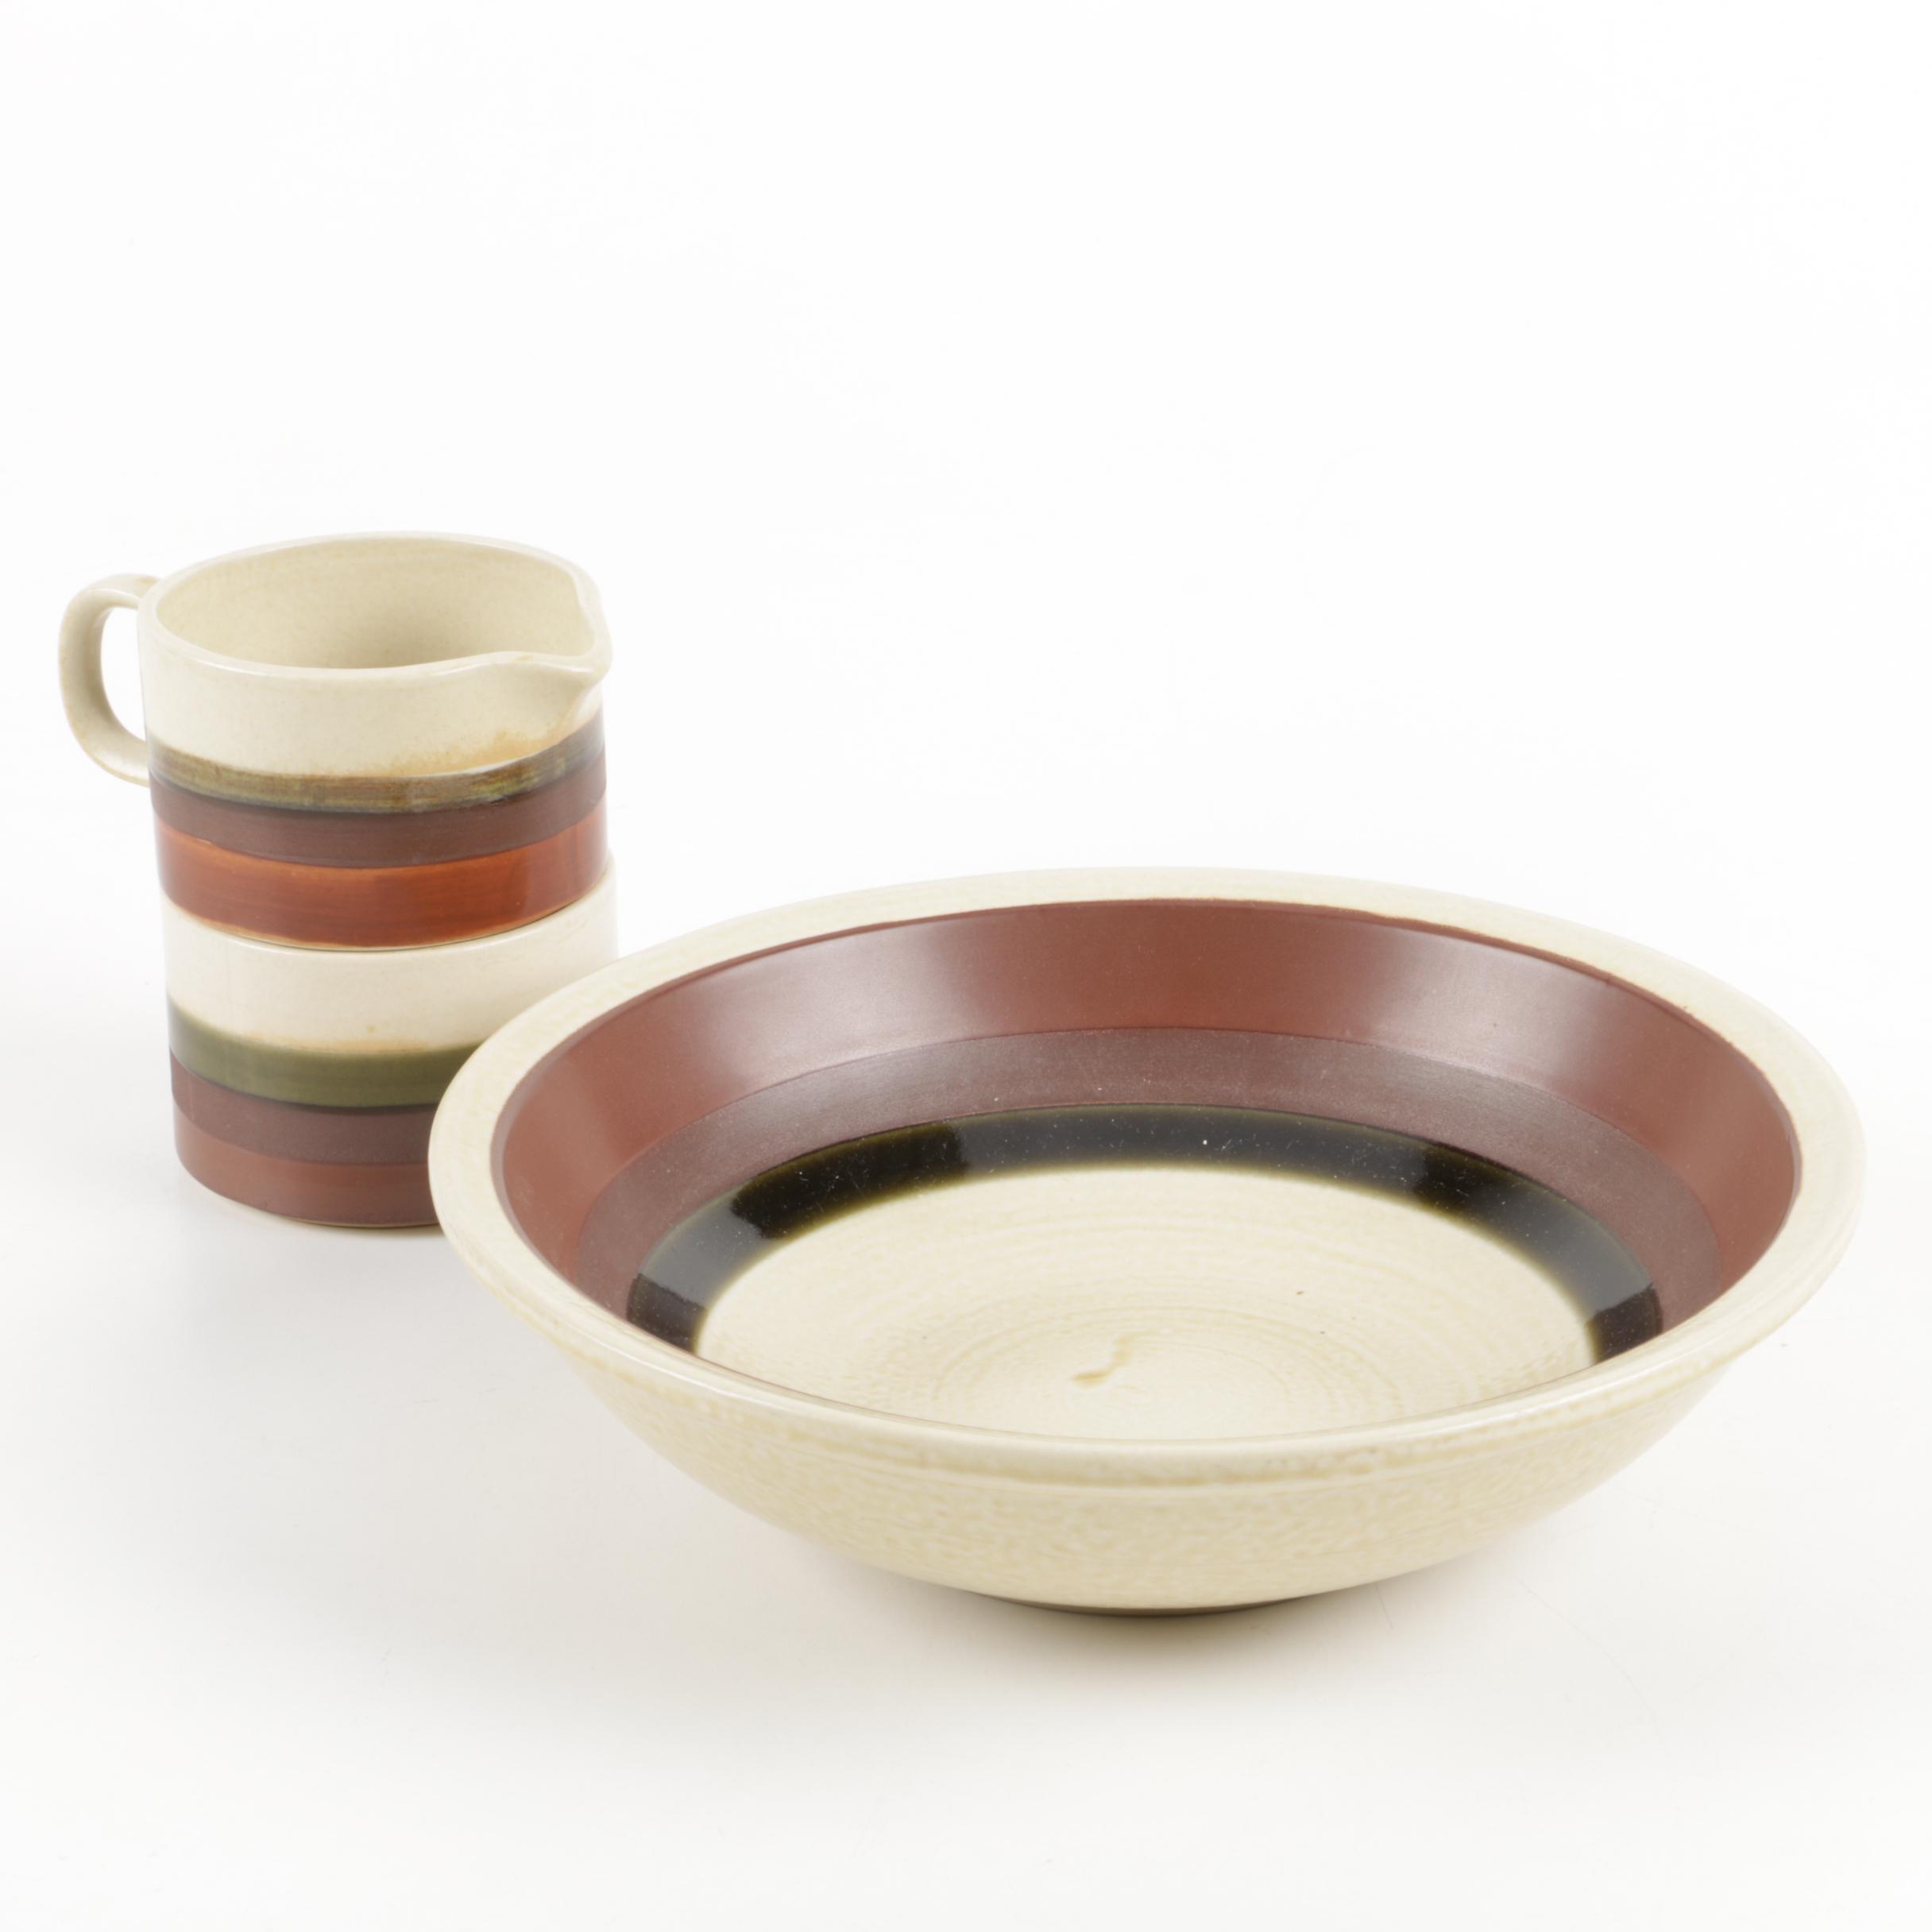 Vintage Japanese Stoneware Serving Pieces